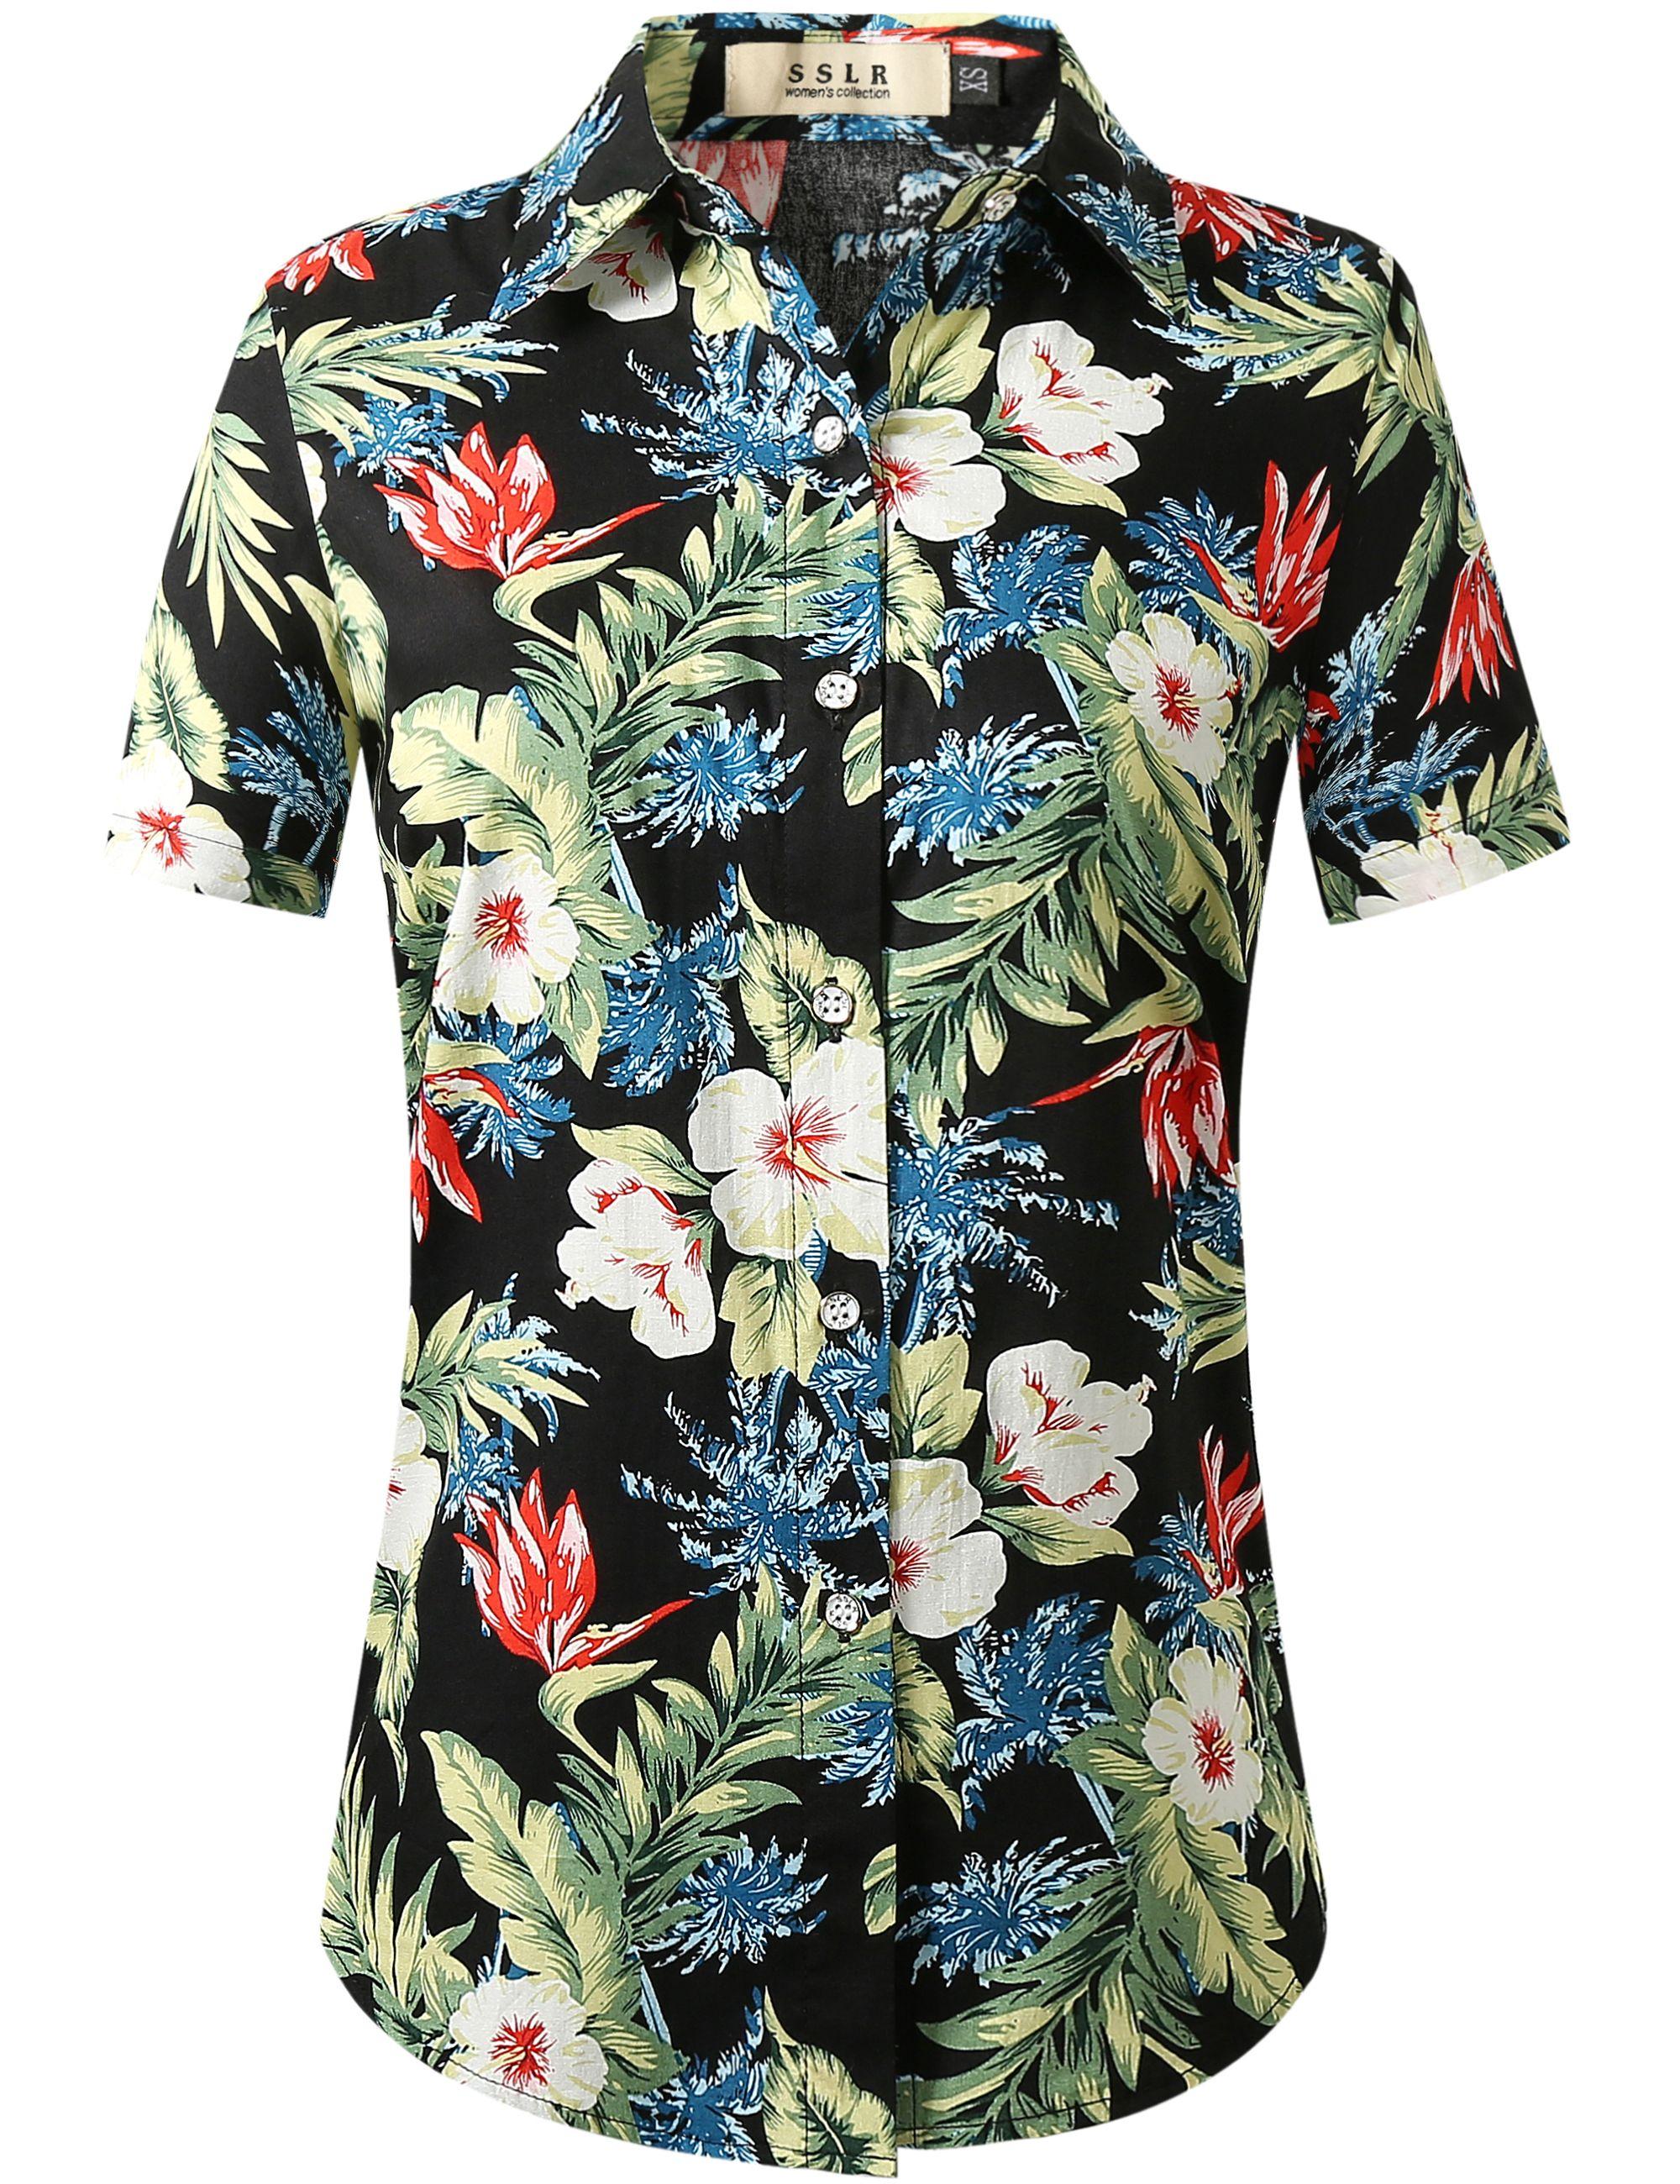 3865664a Summer Tropical Floral Print Hawaiian Shirt for Women, Aloha Tropical Party Hawaiian  Shirt #women #hawaiian shirt #tropical #floral